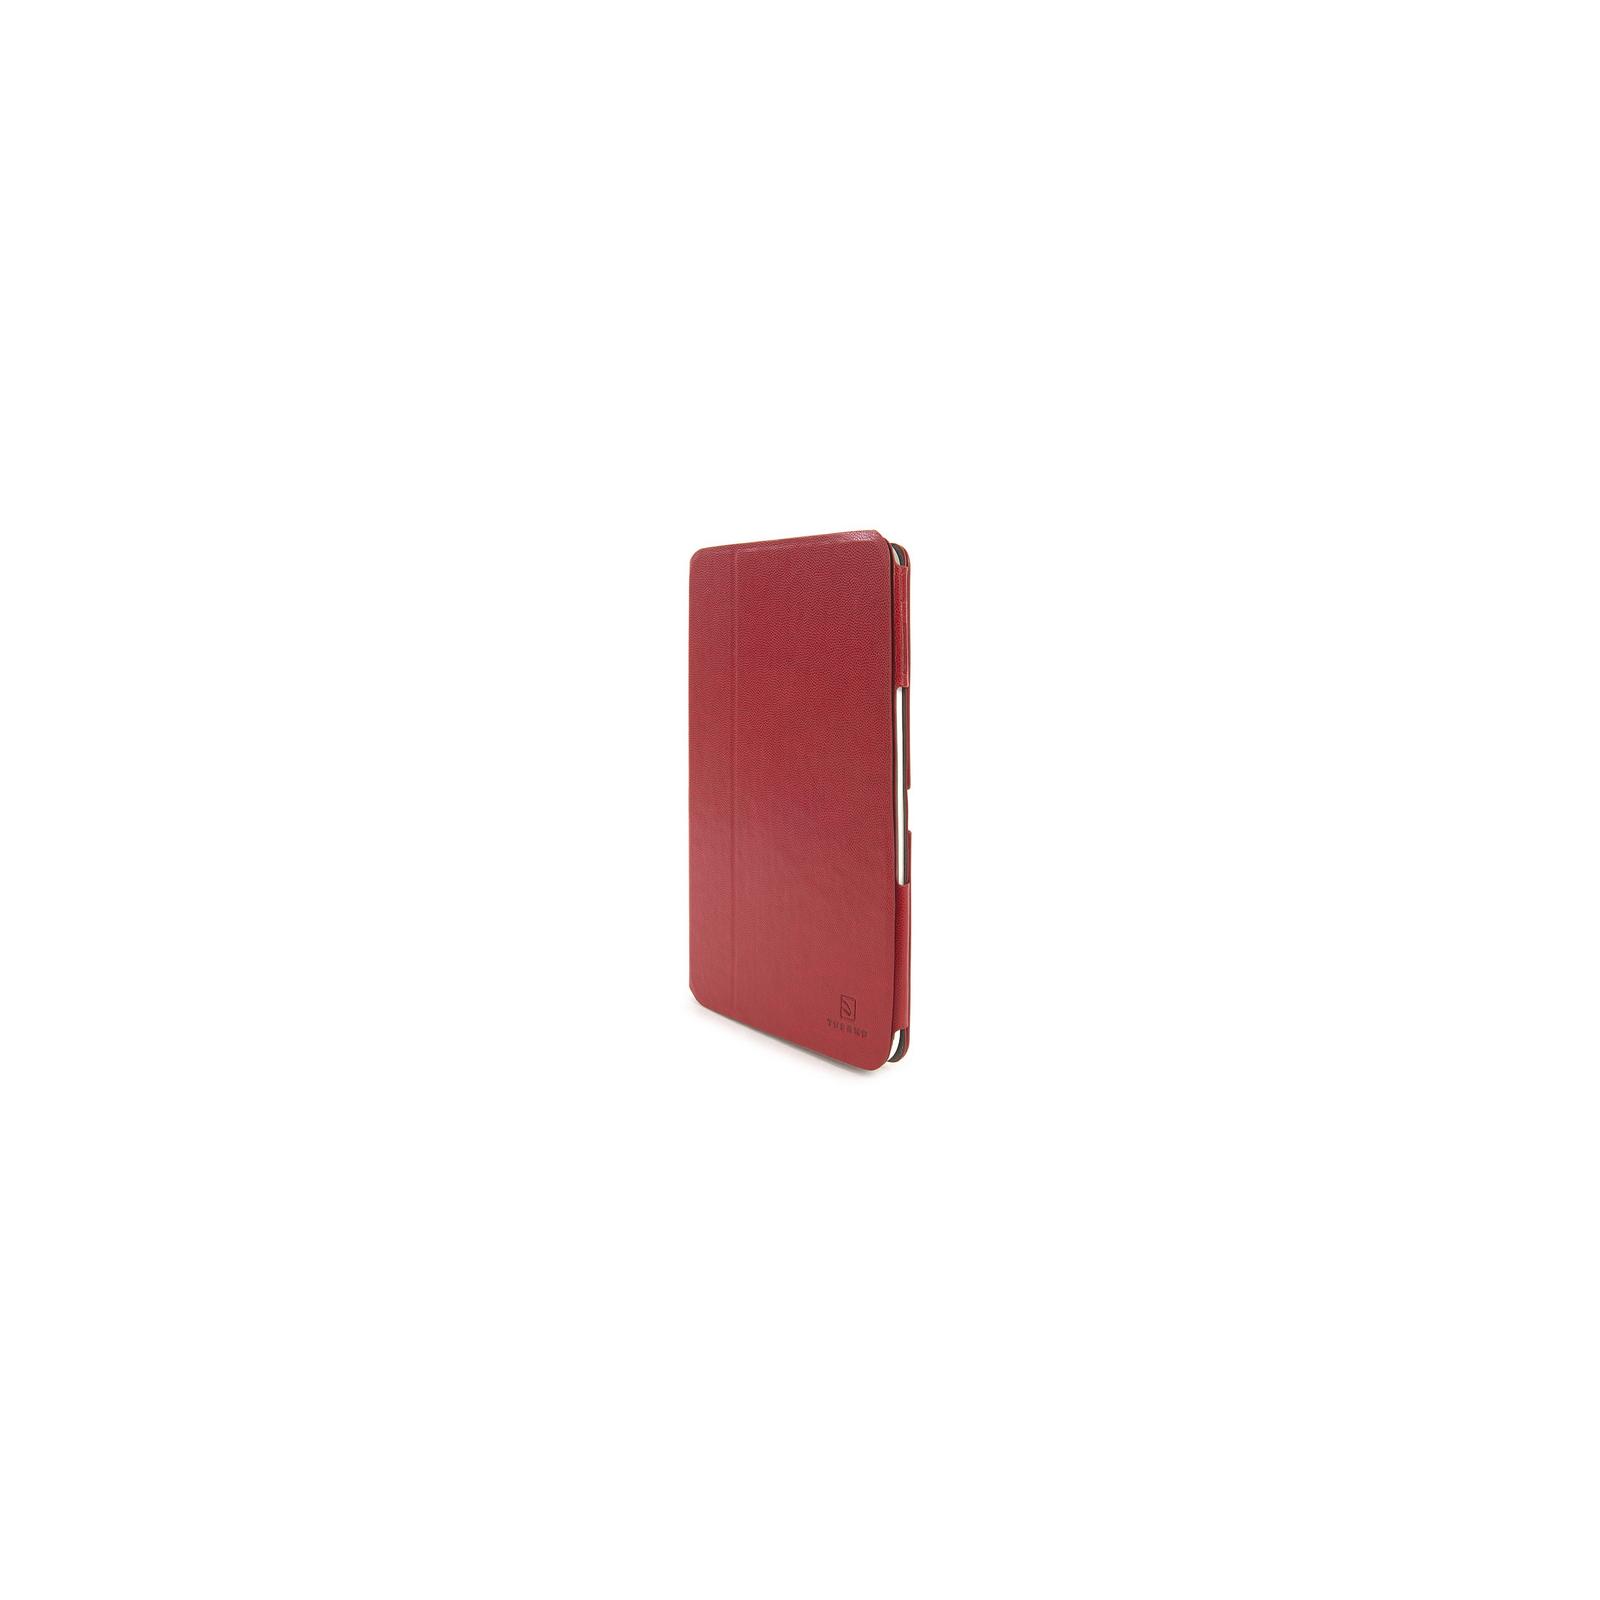 Чехол для планшета Tucano Galaxy Tab 3 10.1 Leggero Red (TAB-LS310-R) изображение 2